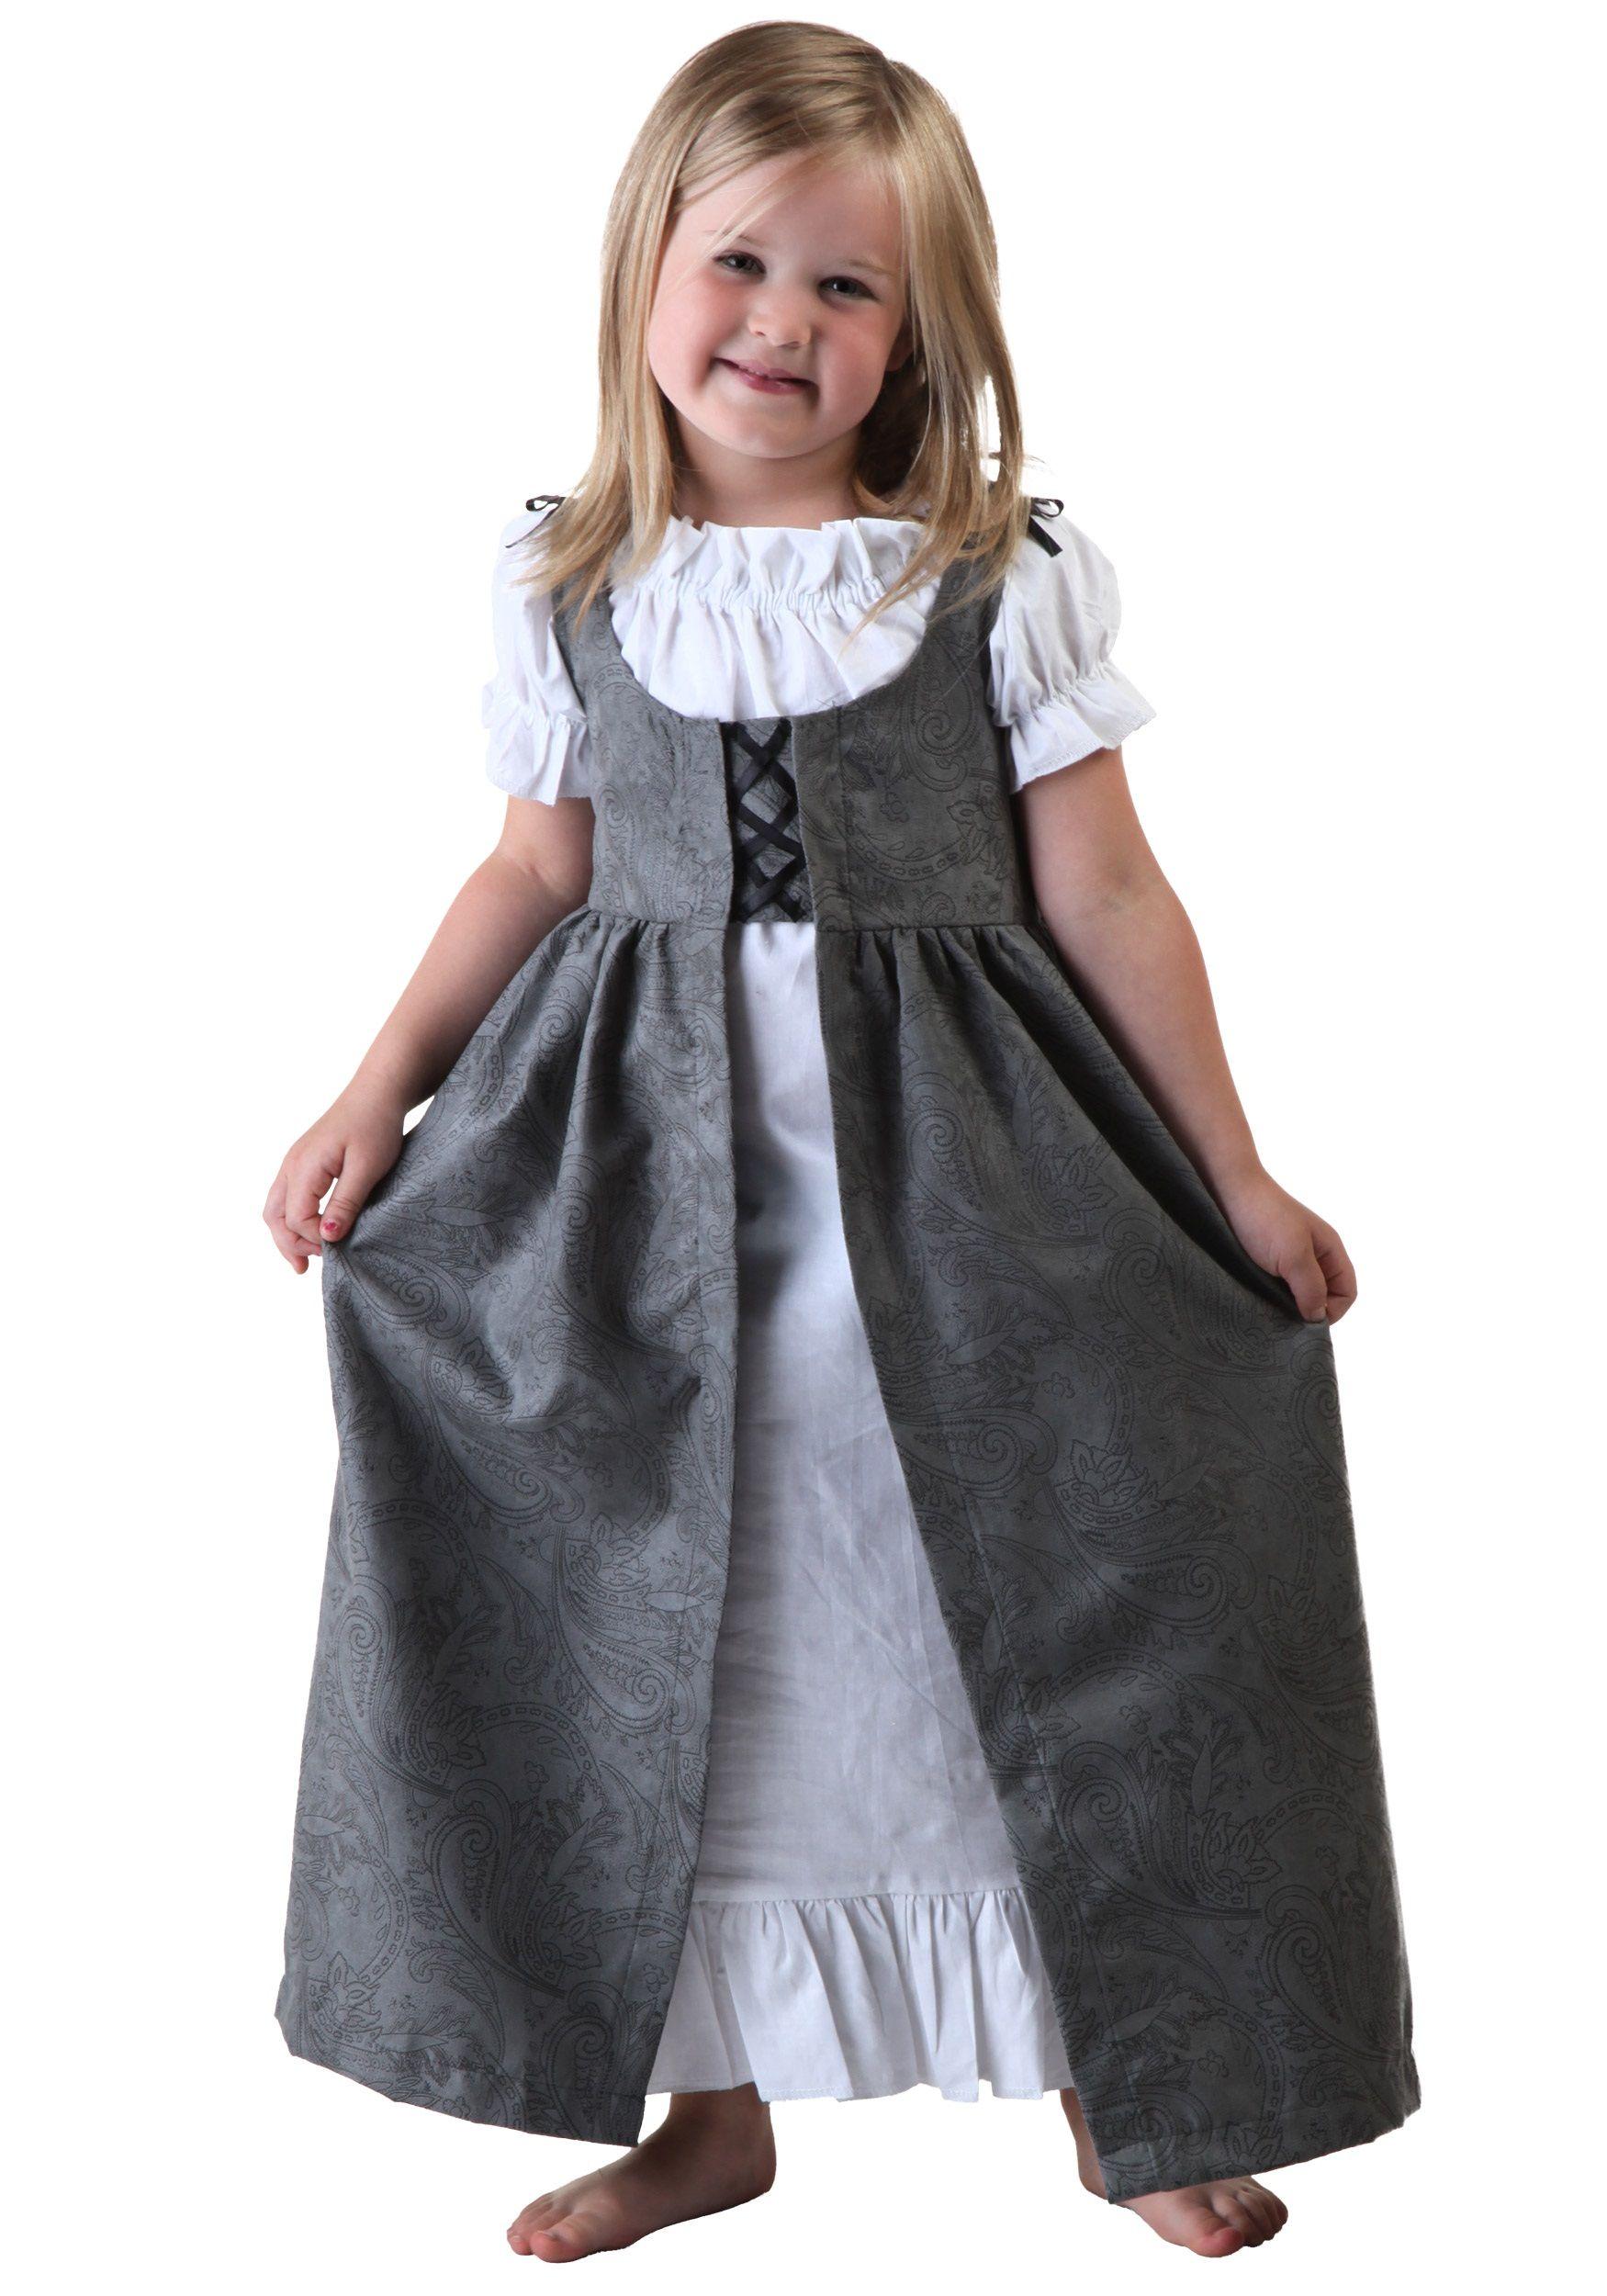 e95013fe224c renaissance dresses for toddlers | ... Costumes Child Renaissance Costumes  Girls Toddler Medieval Dress